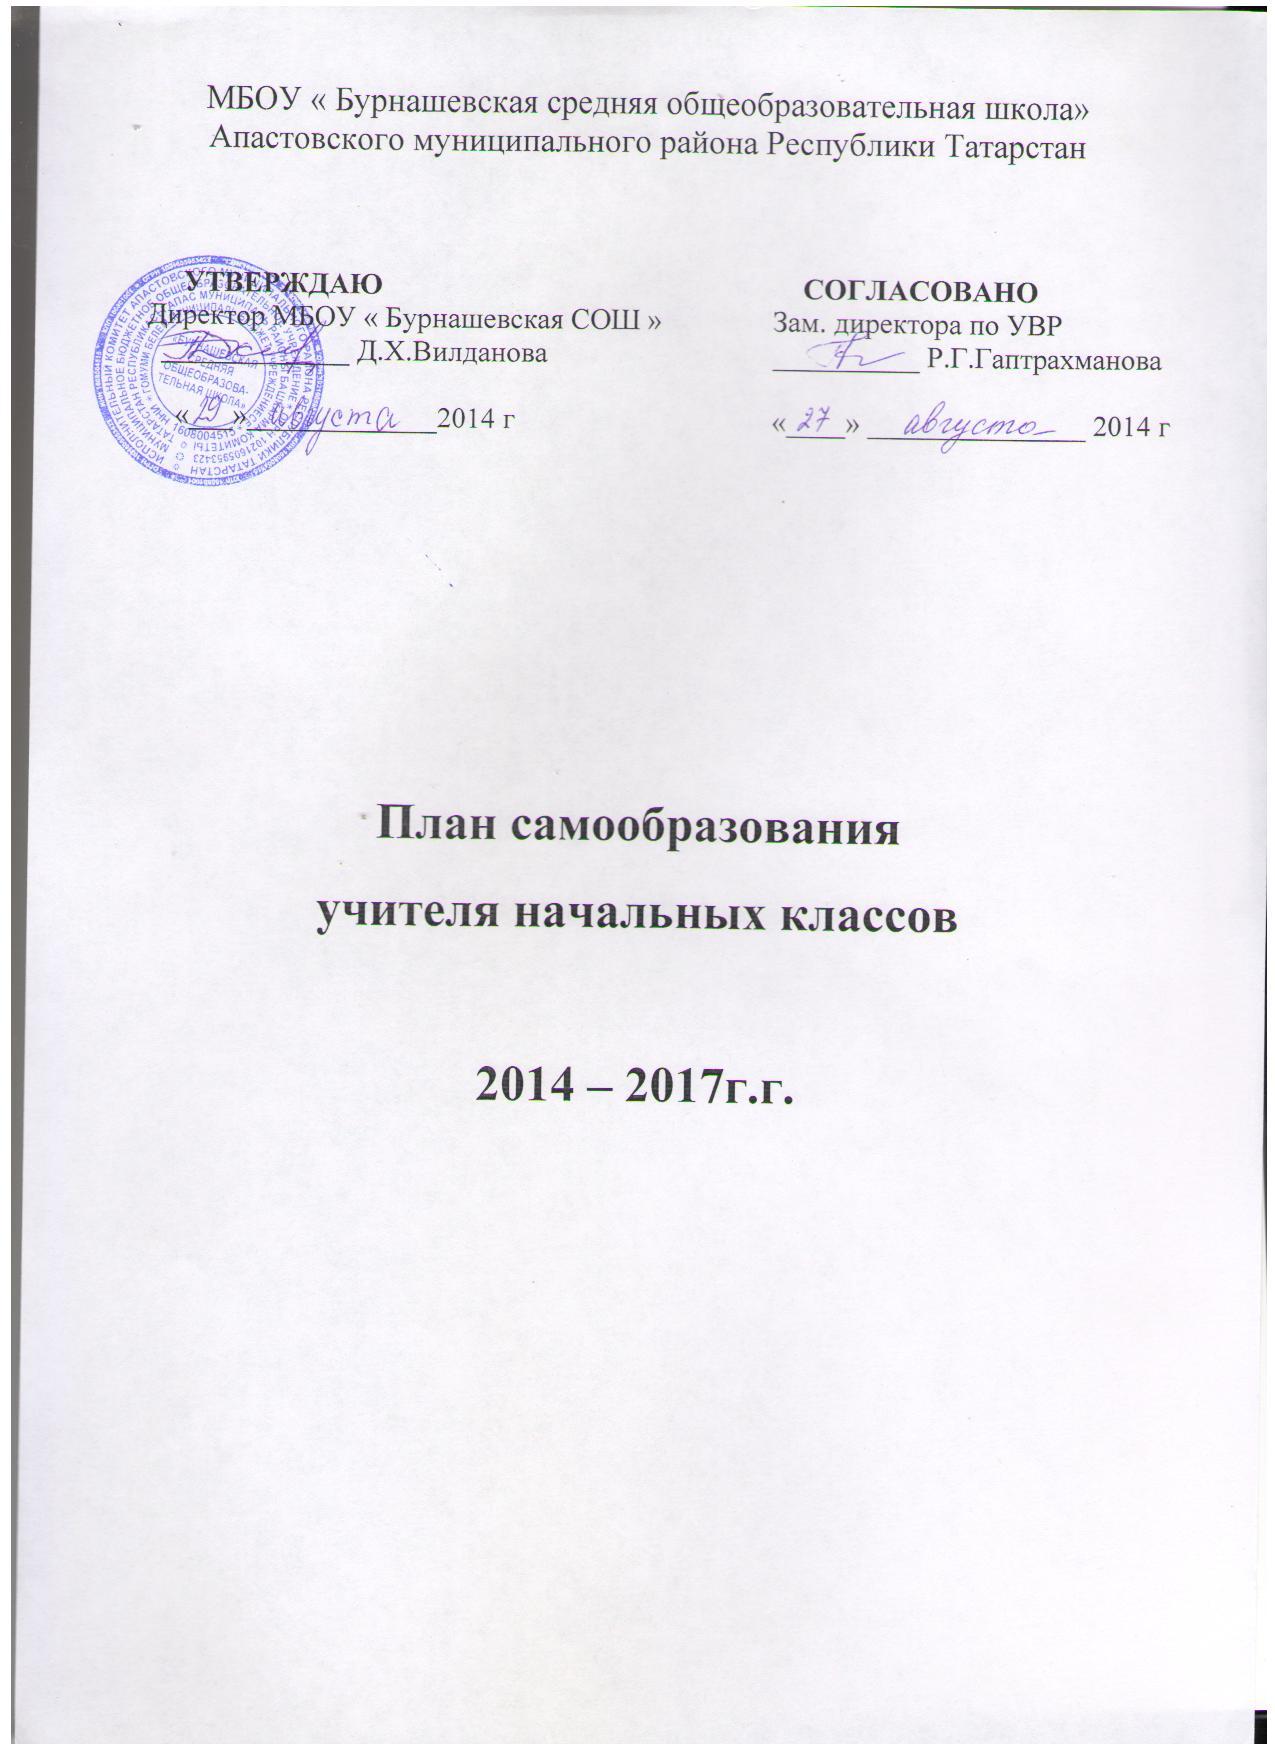 H:\Documents and Settings\User\Рабочий стол\Изображение 001.jpg